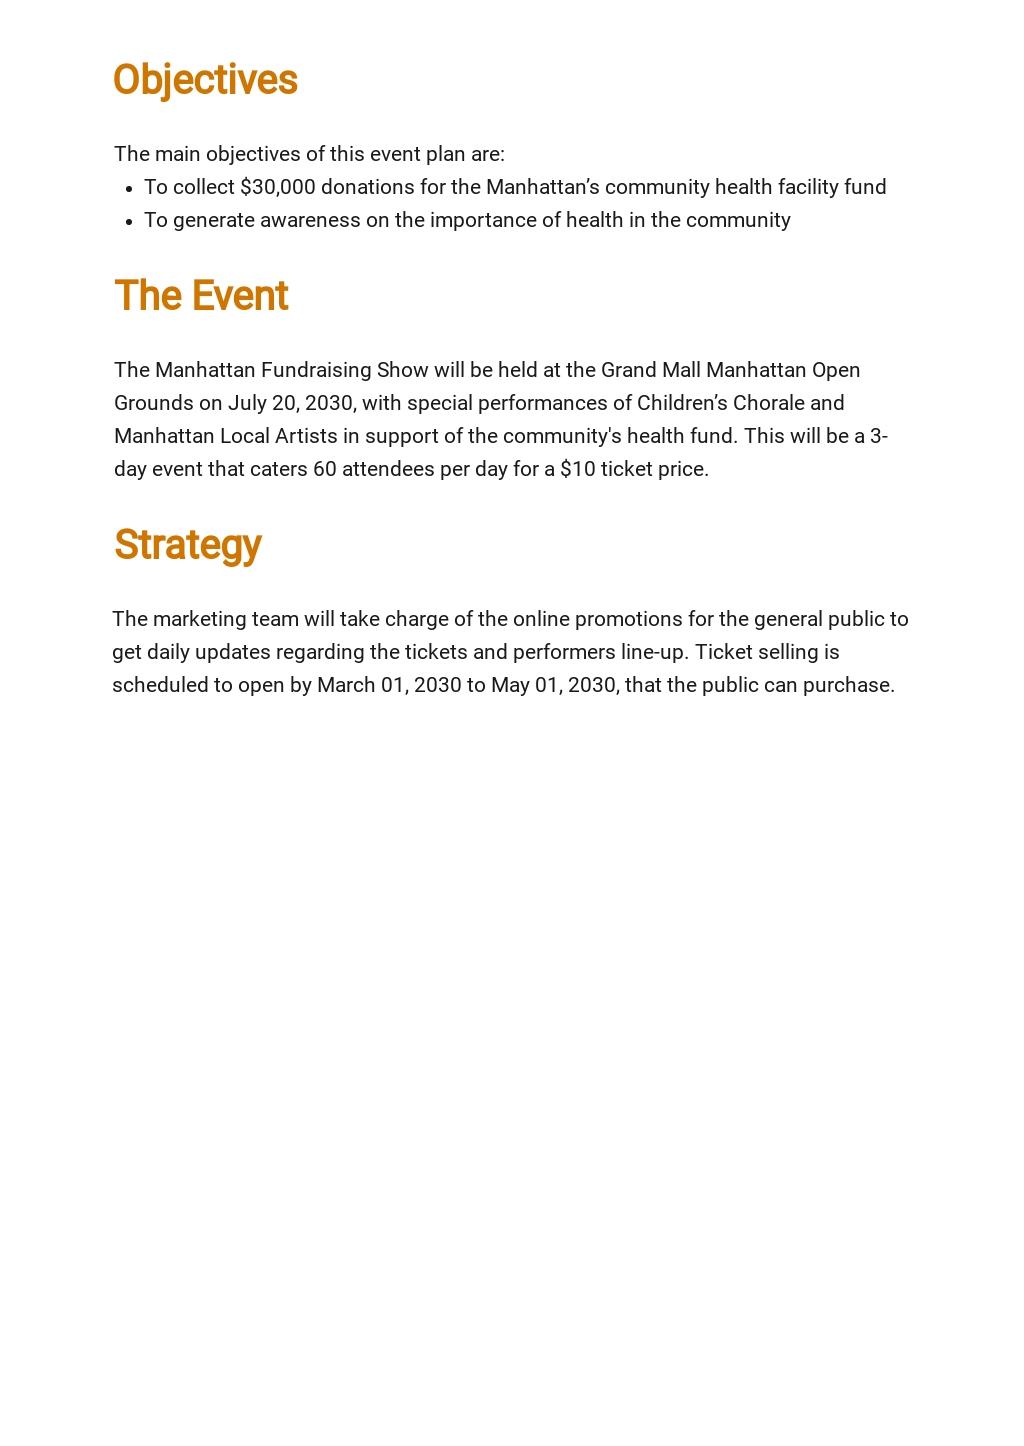 Annual Fundraising Plan Template 1.jpe